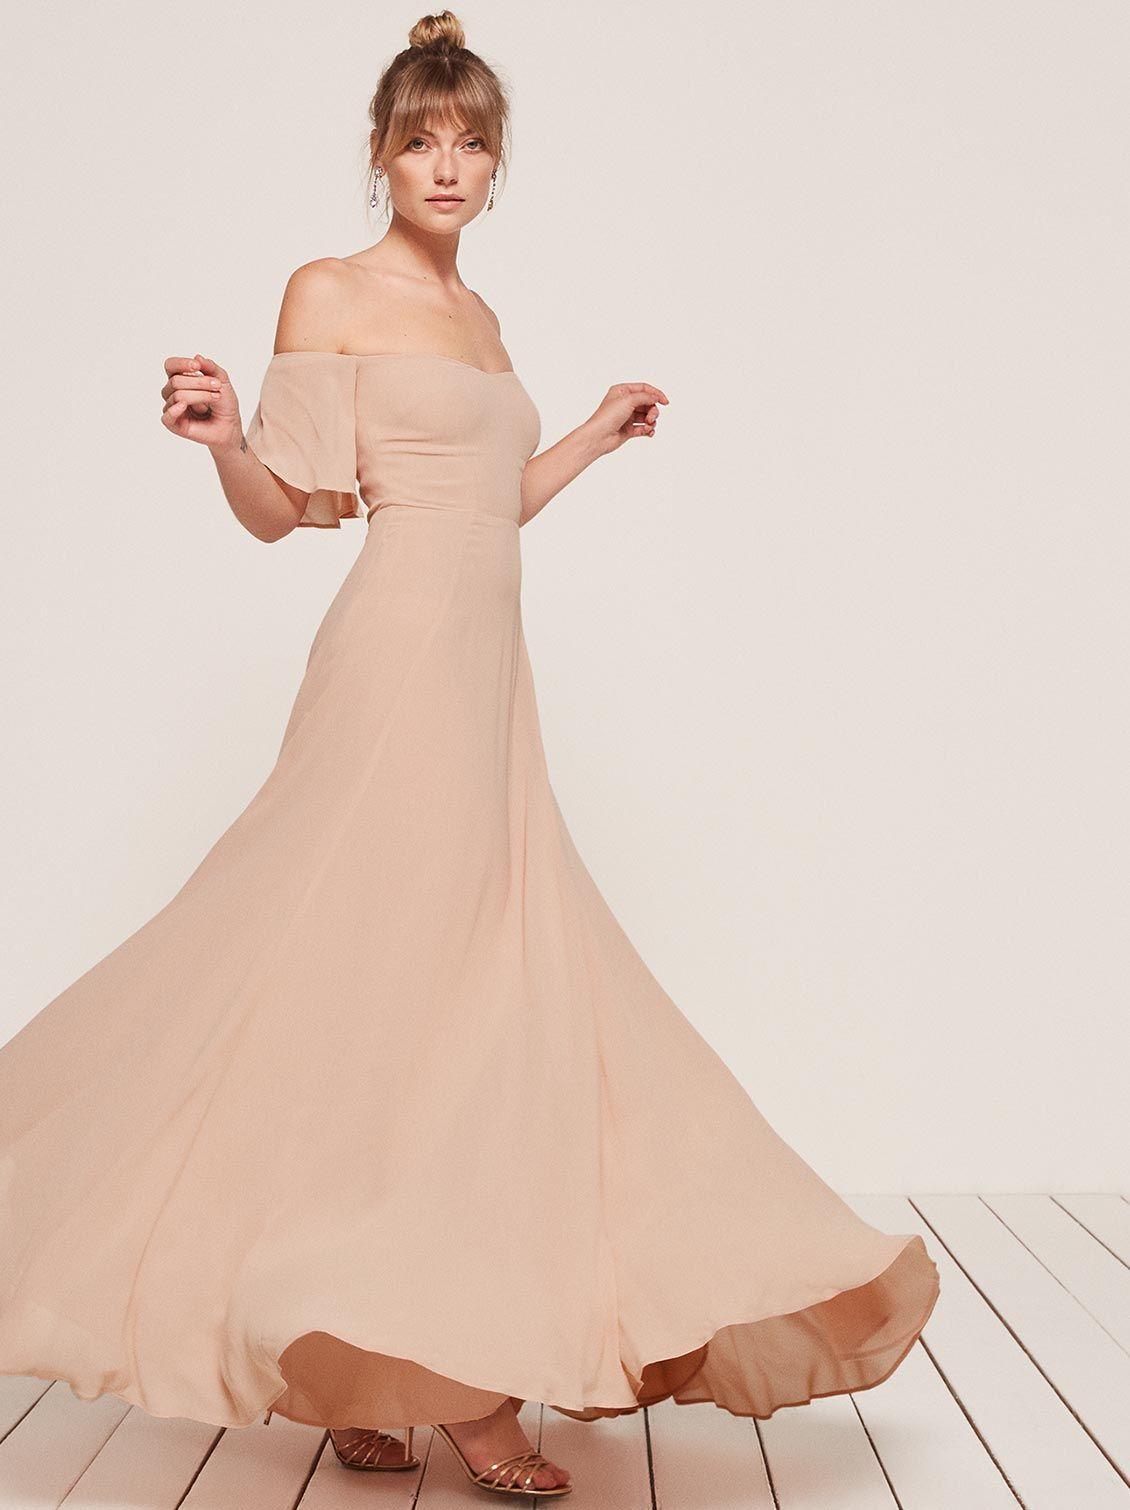 Weddings reformation wedding guest wardrobe ideas pinterest